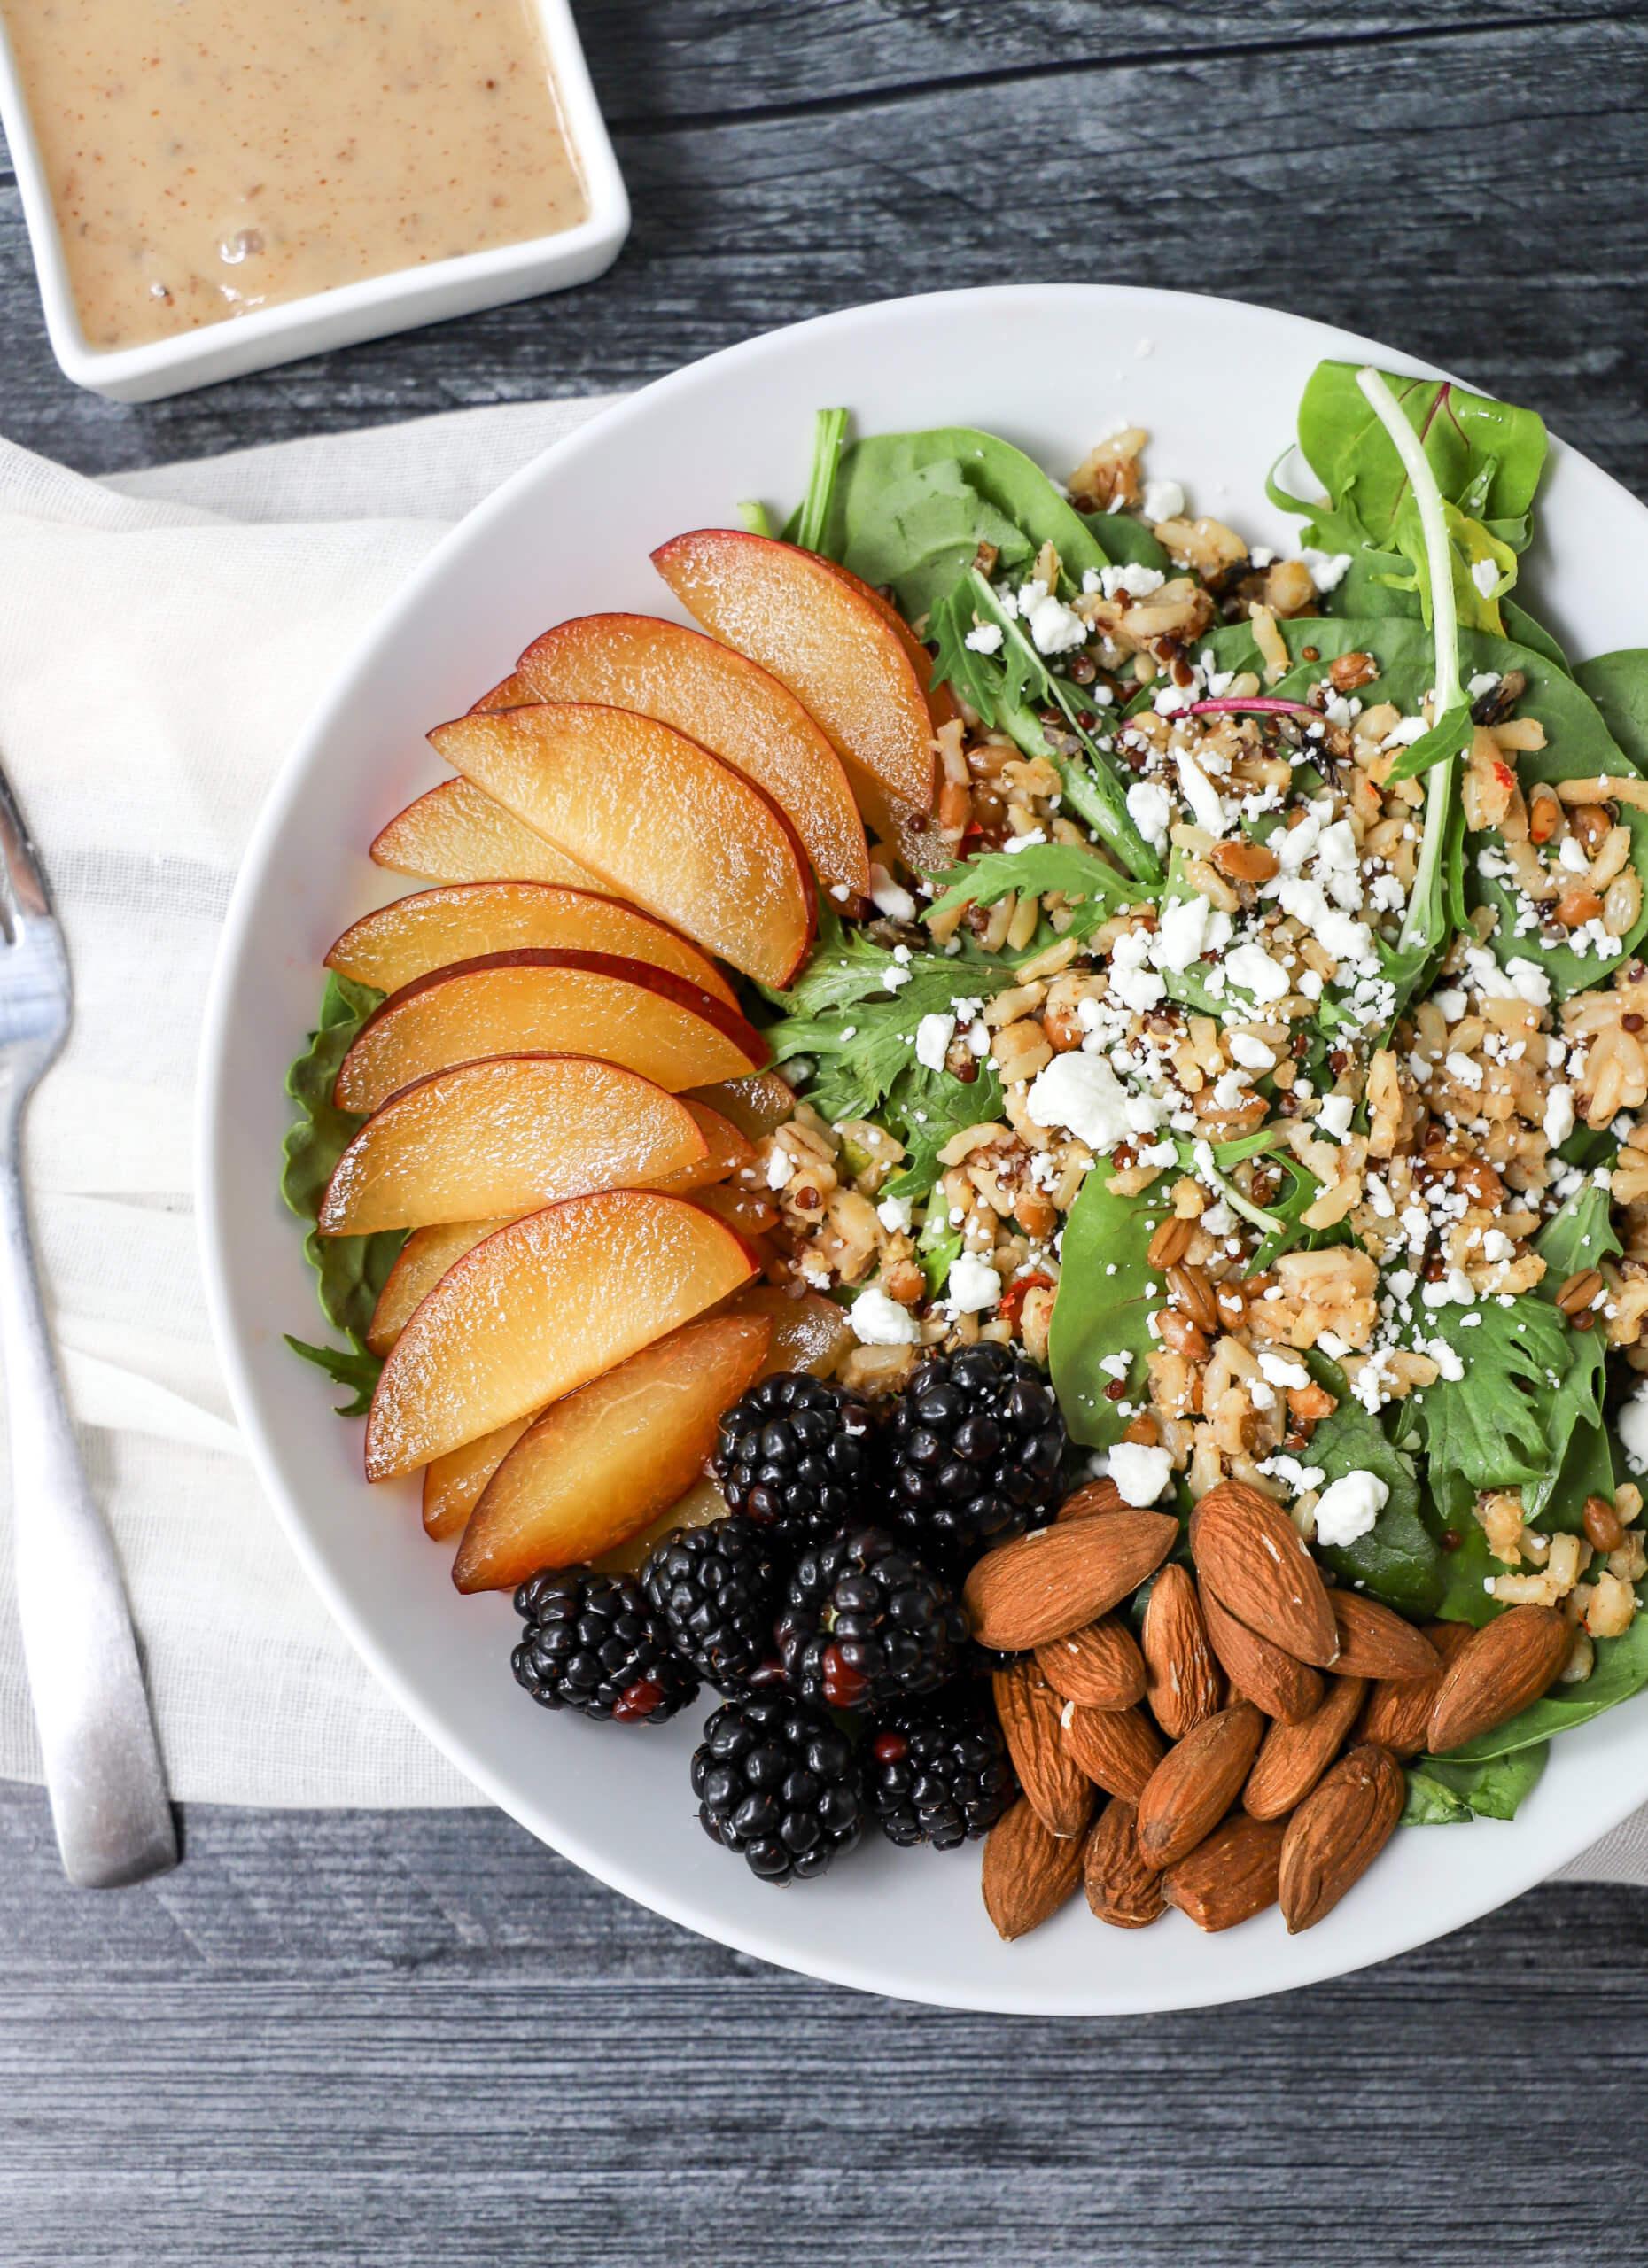 Plum and Blackbery Grain Salad